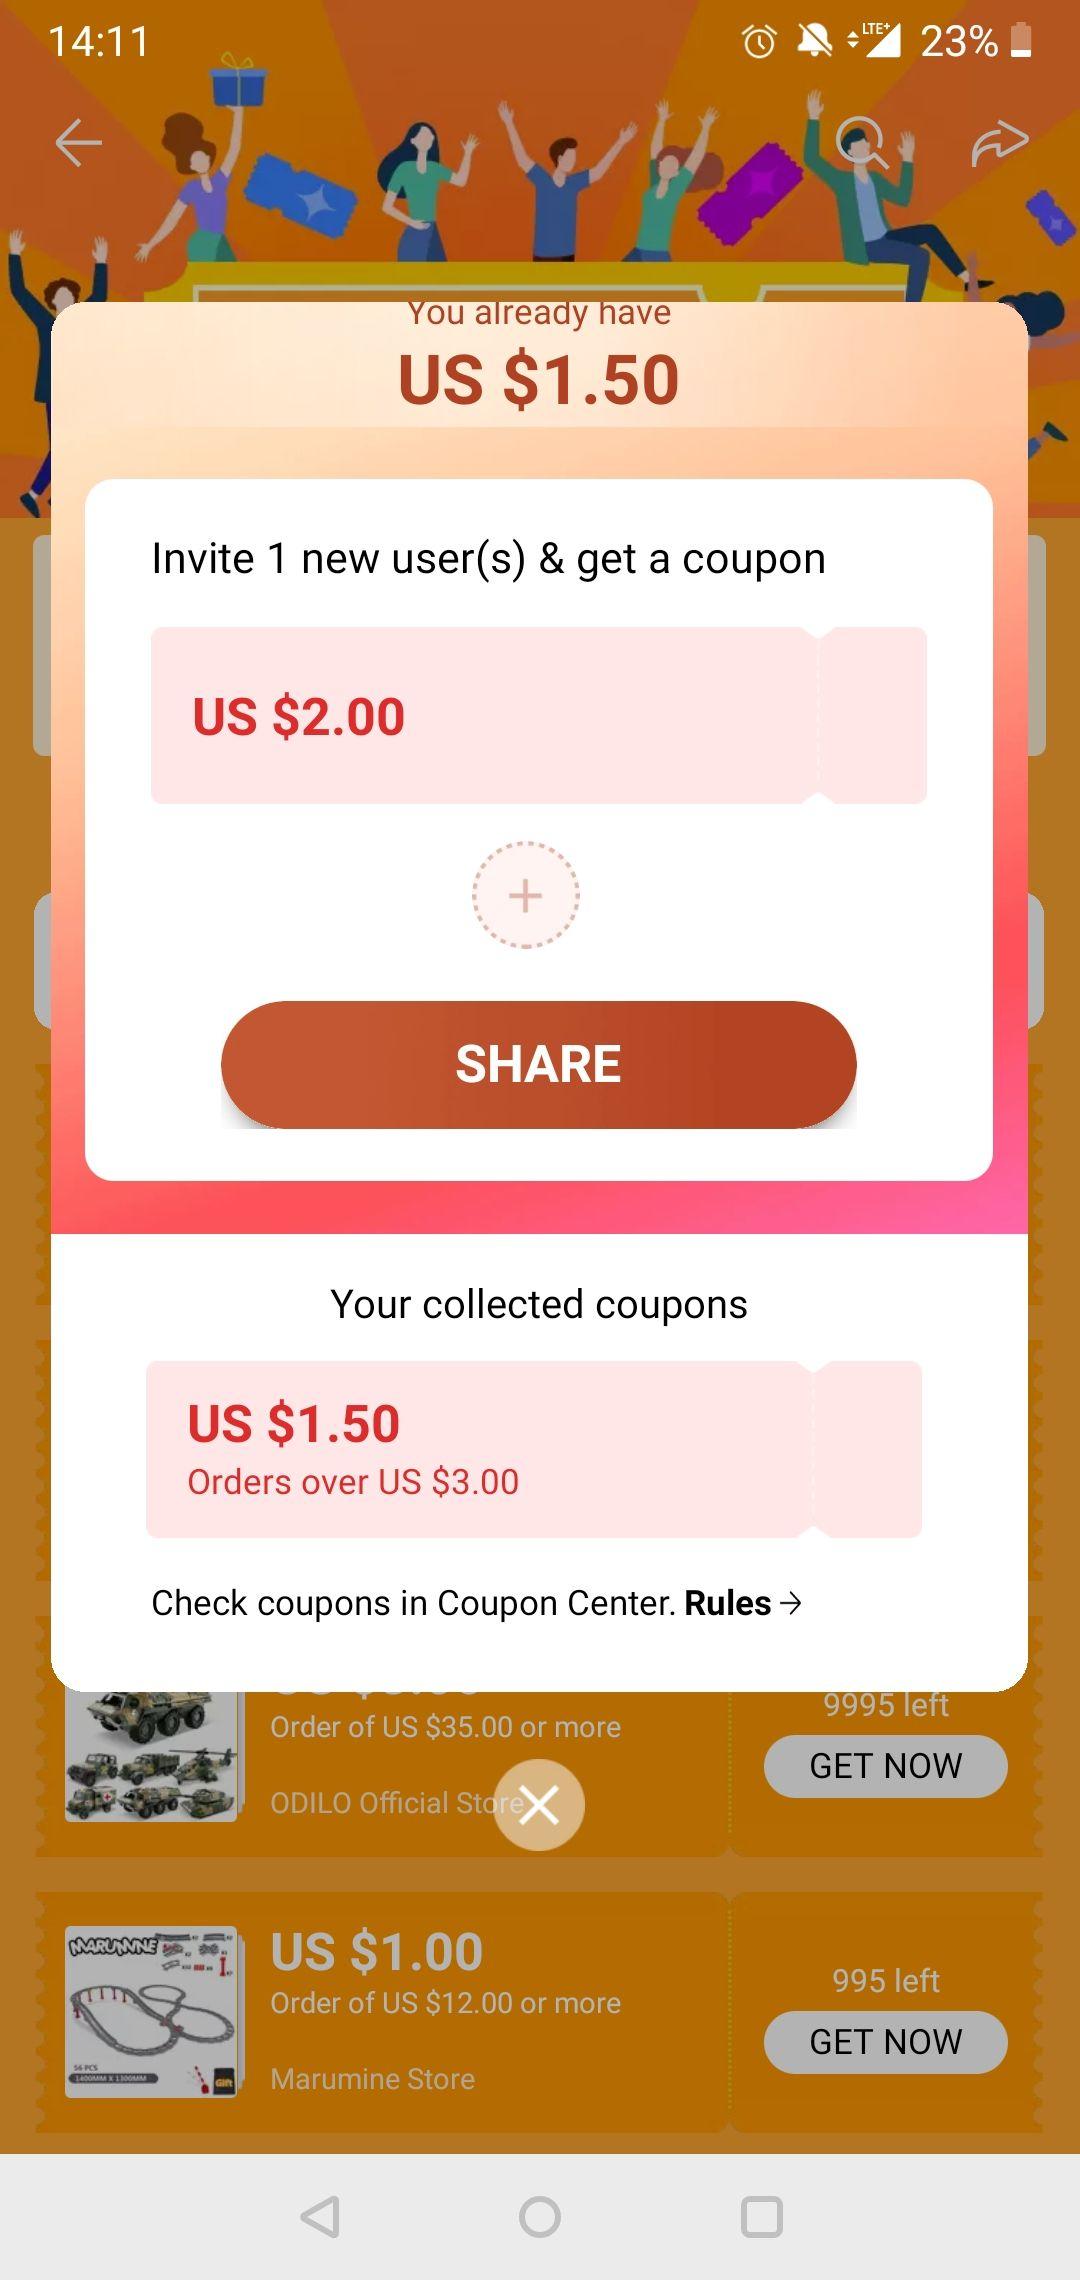 Kupon 1,5/3$ w aplikacji aliexpress (coupon center)